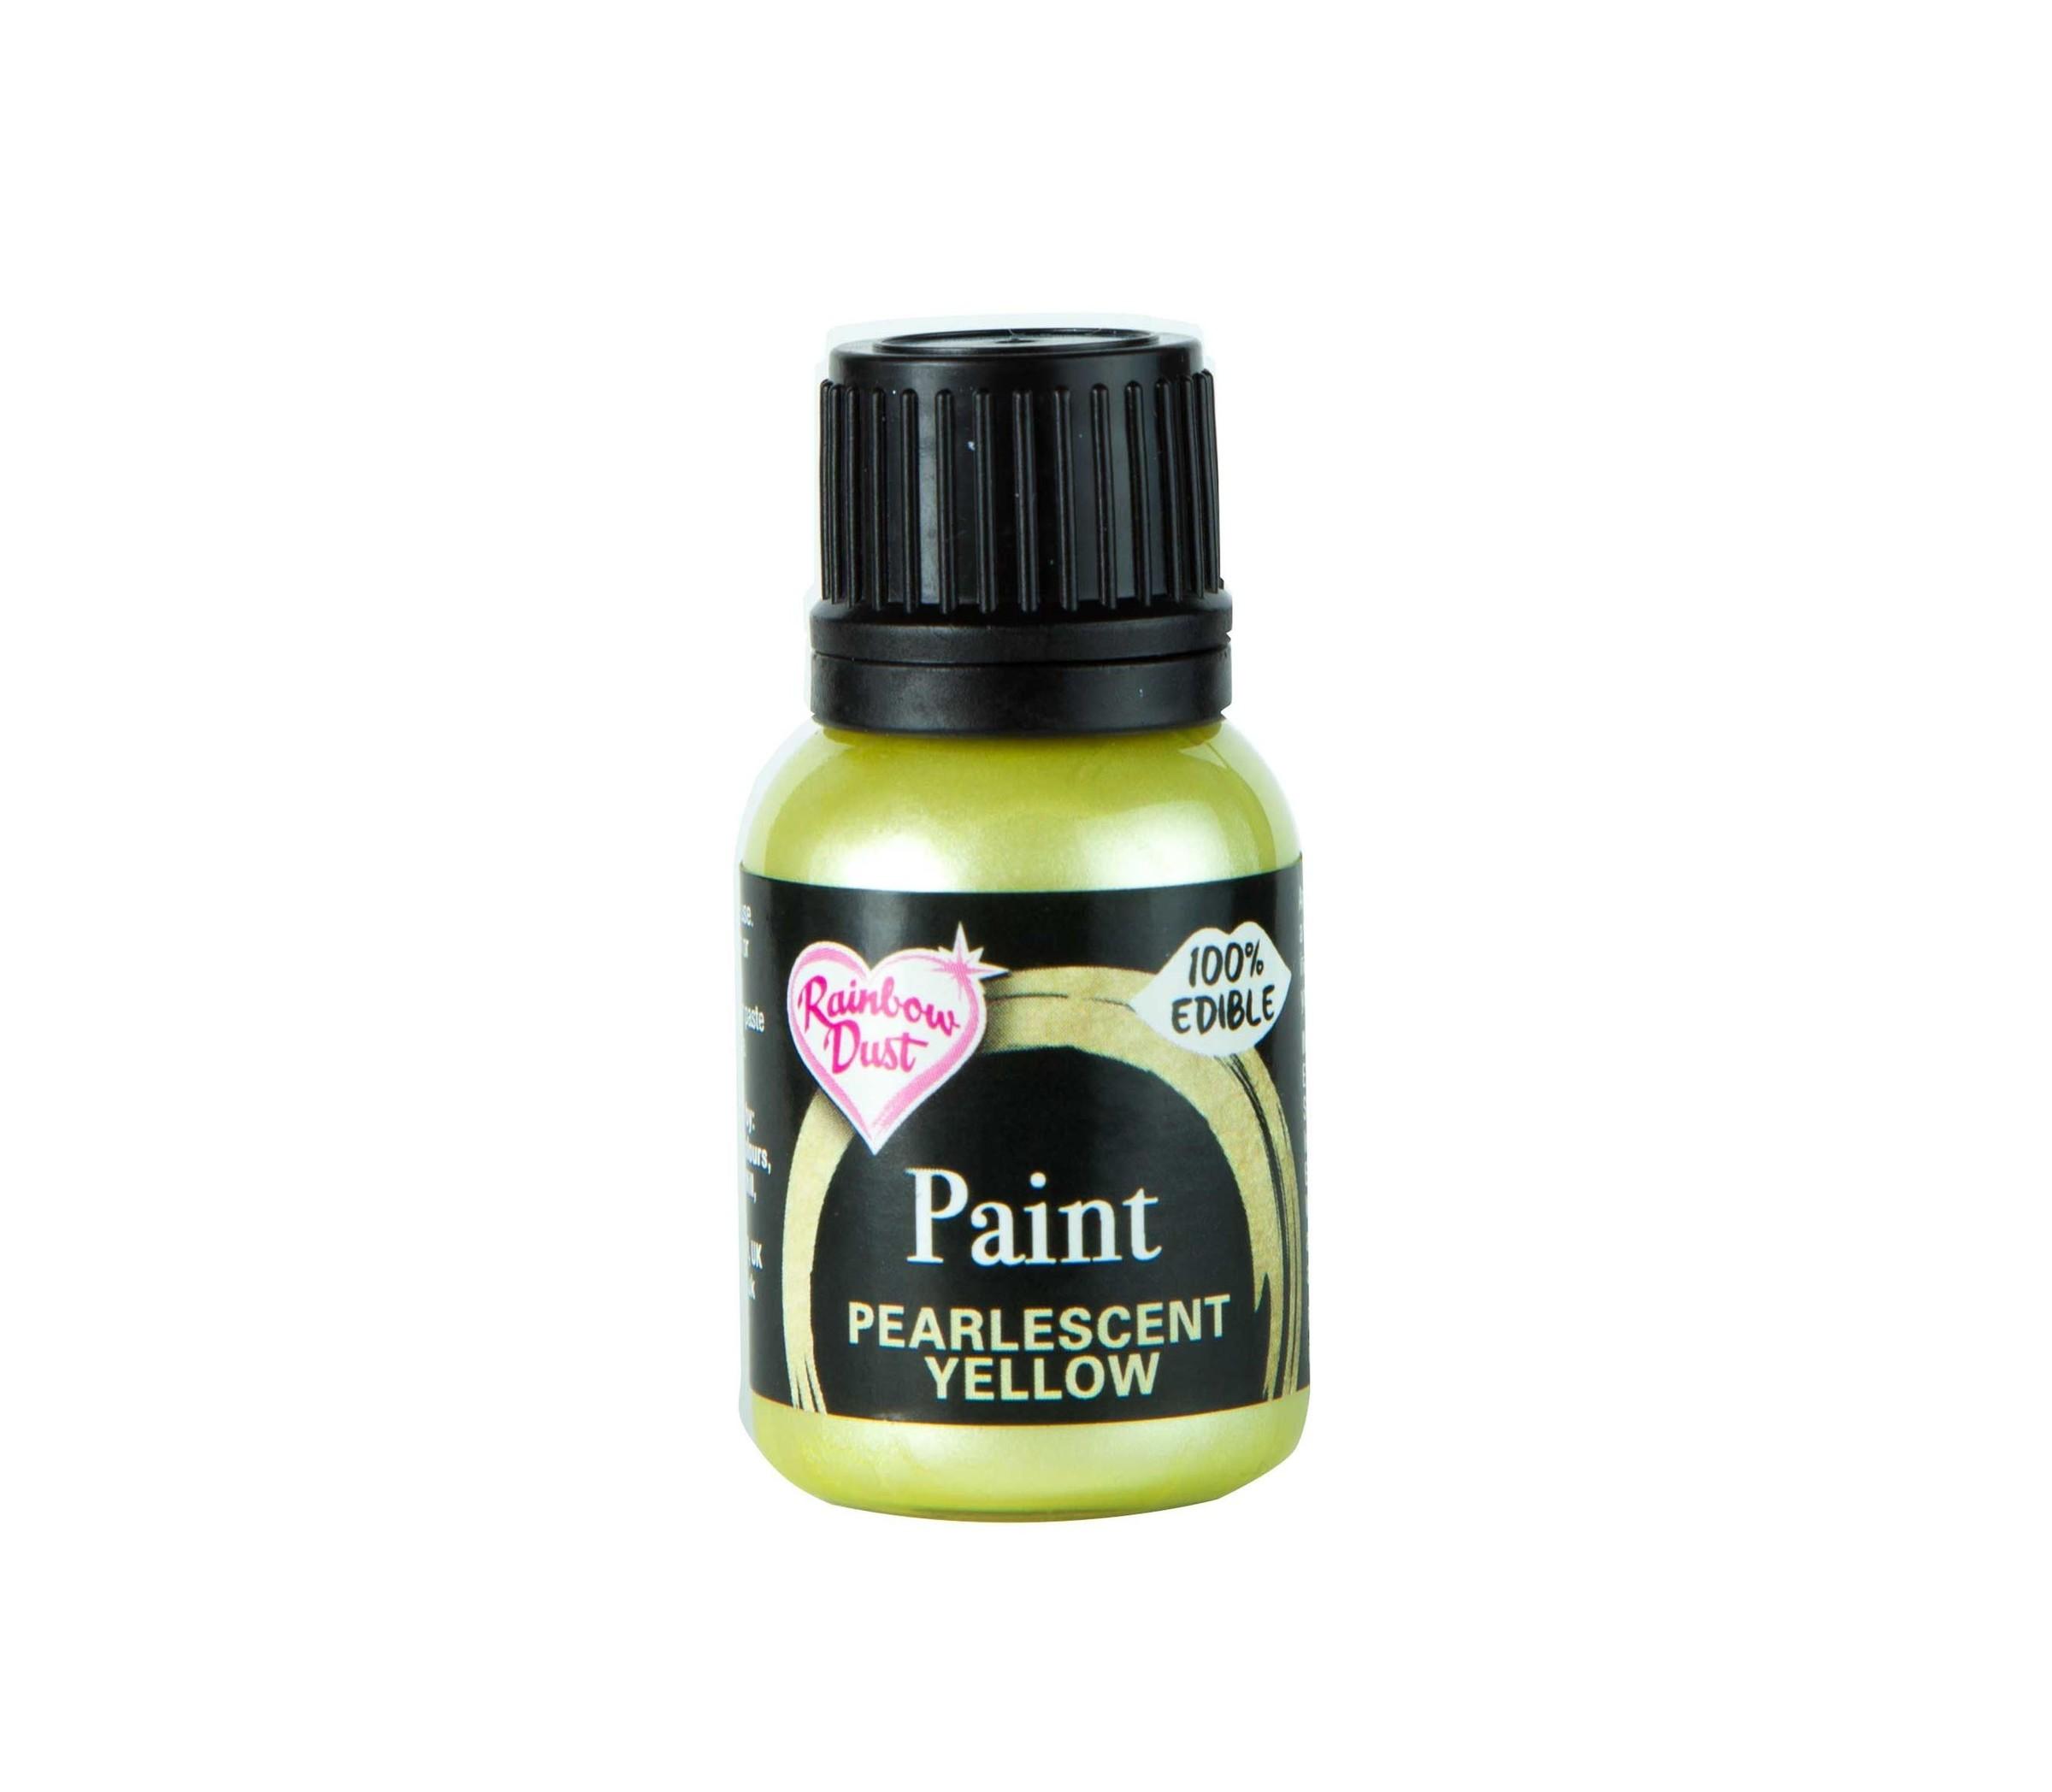 metallic-pearl-yellow-bottle.jpg